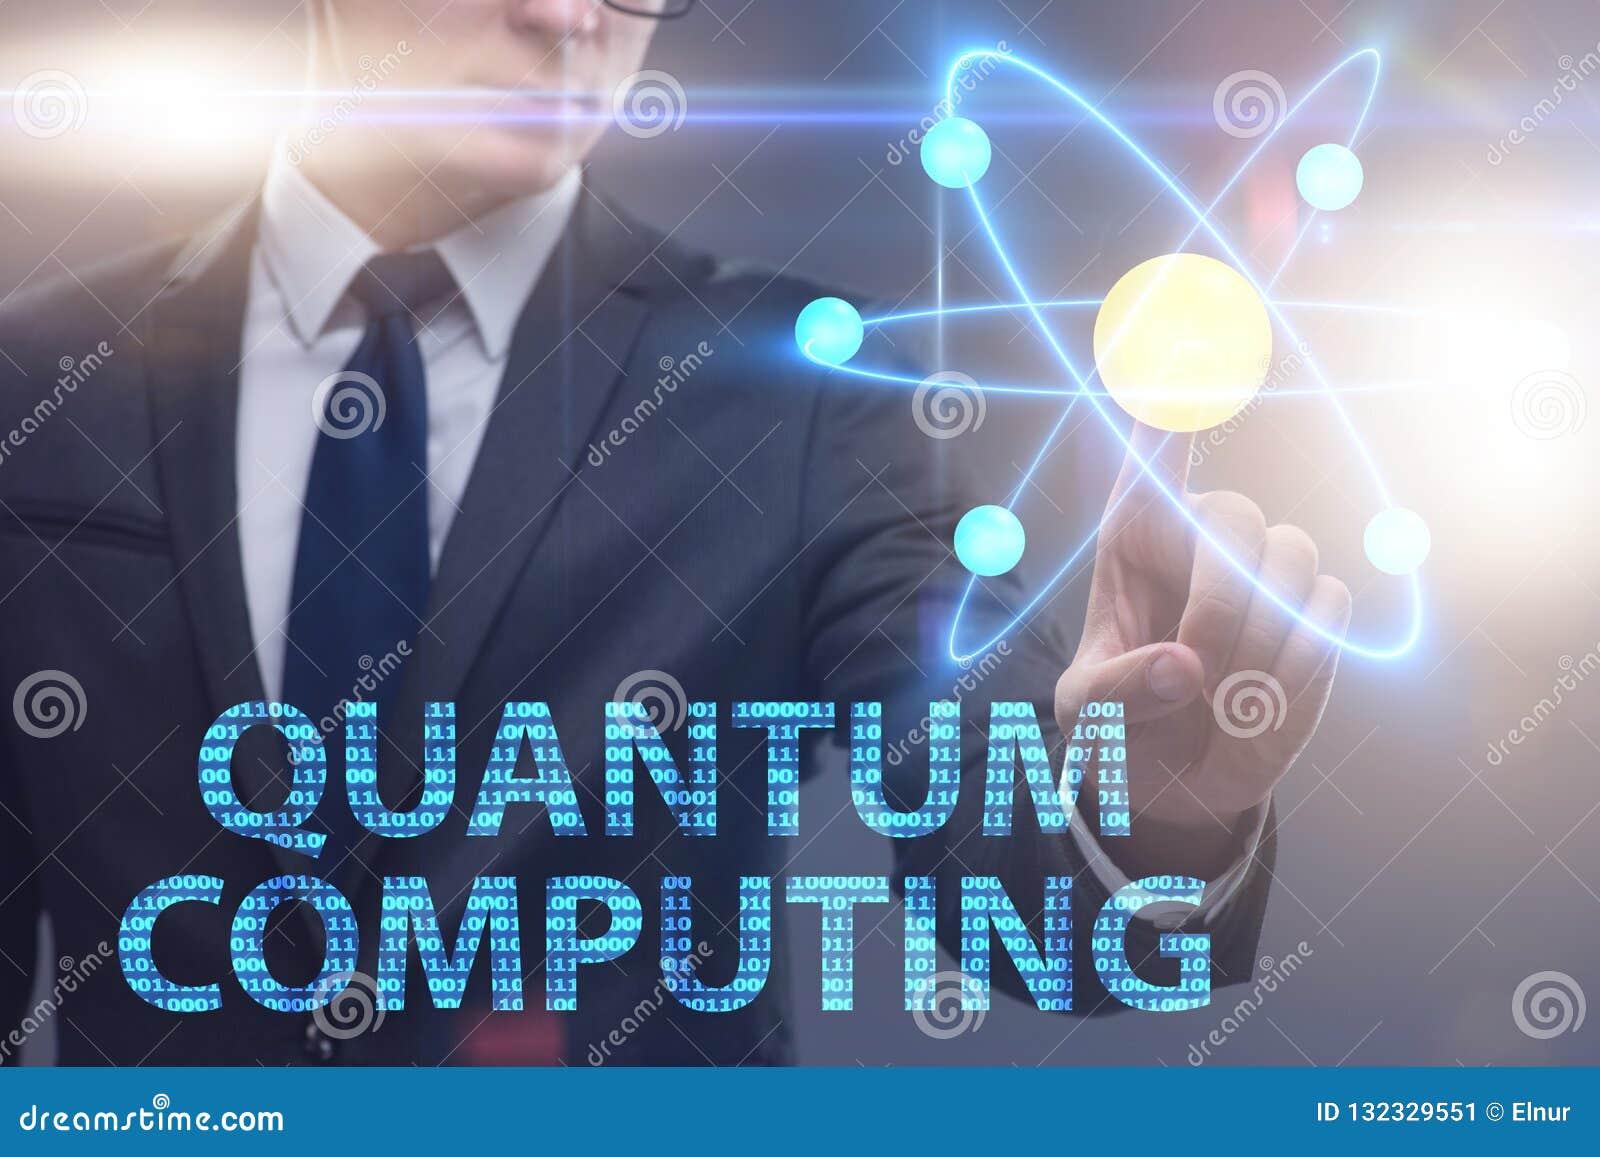 The Businessman Pressing Virtual Button In Quantum Computing Concept